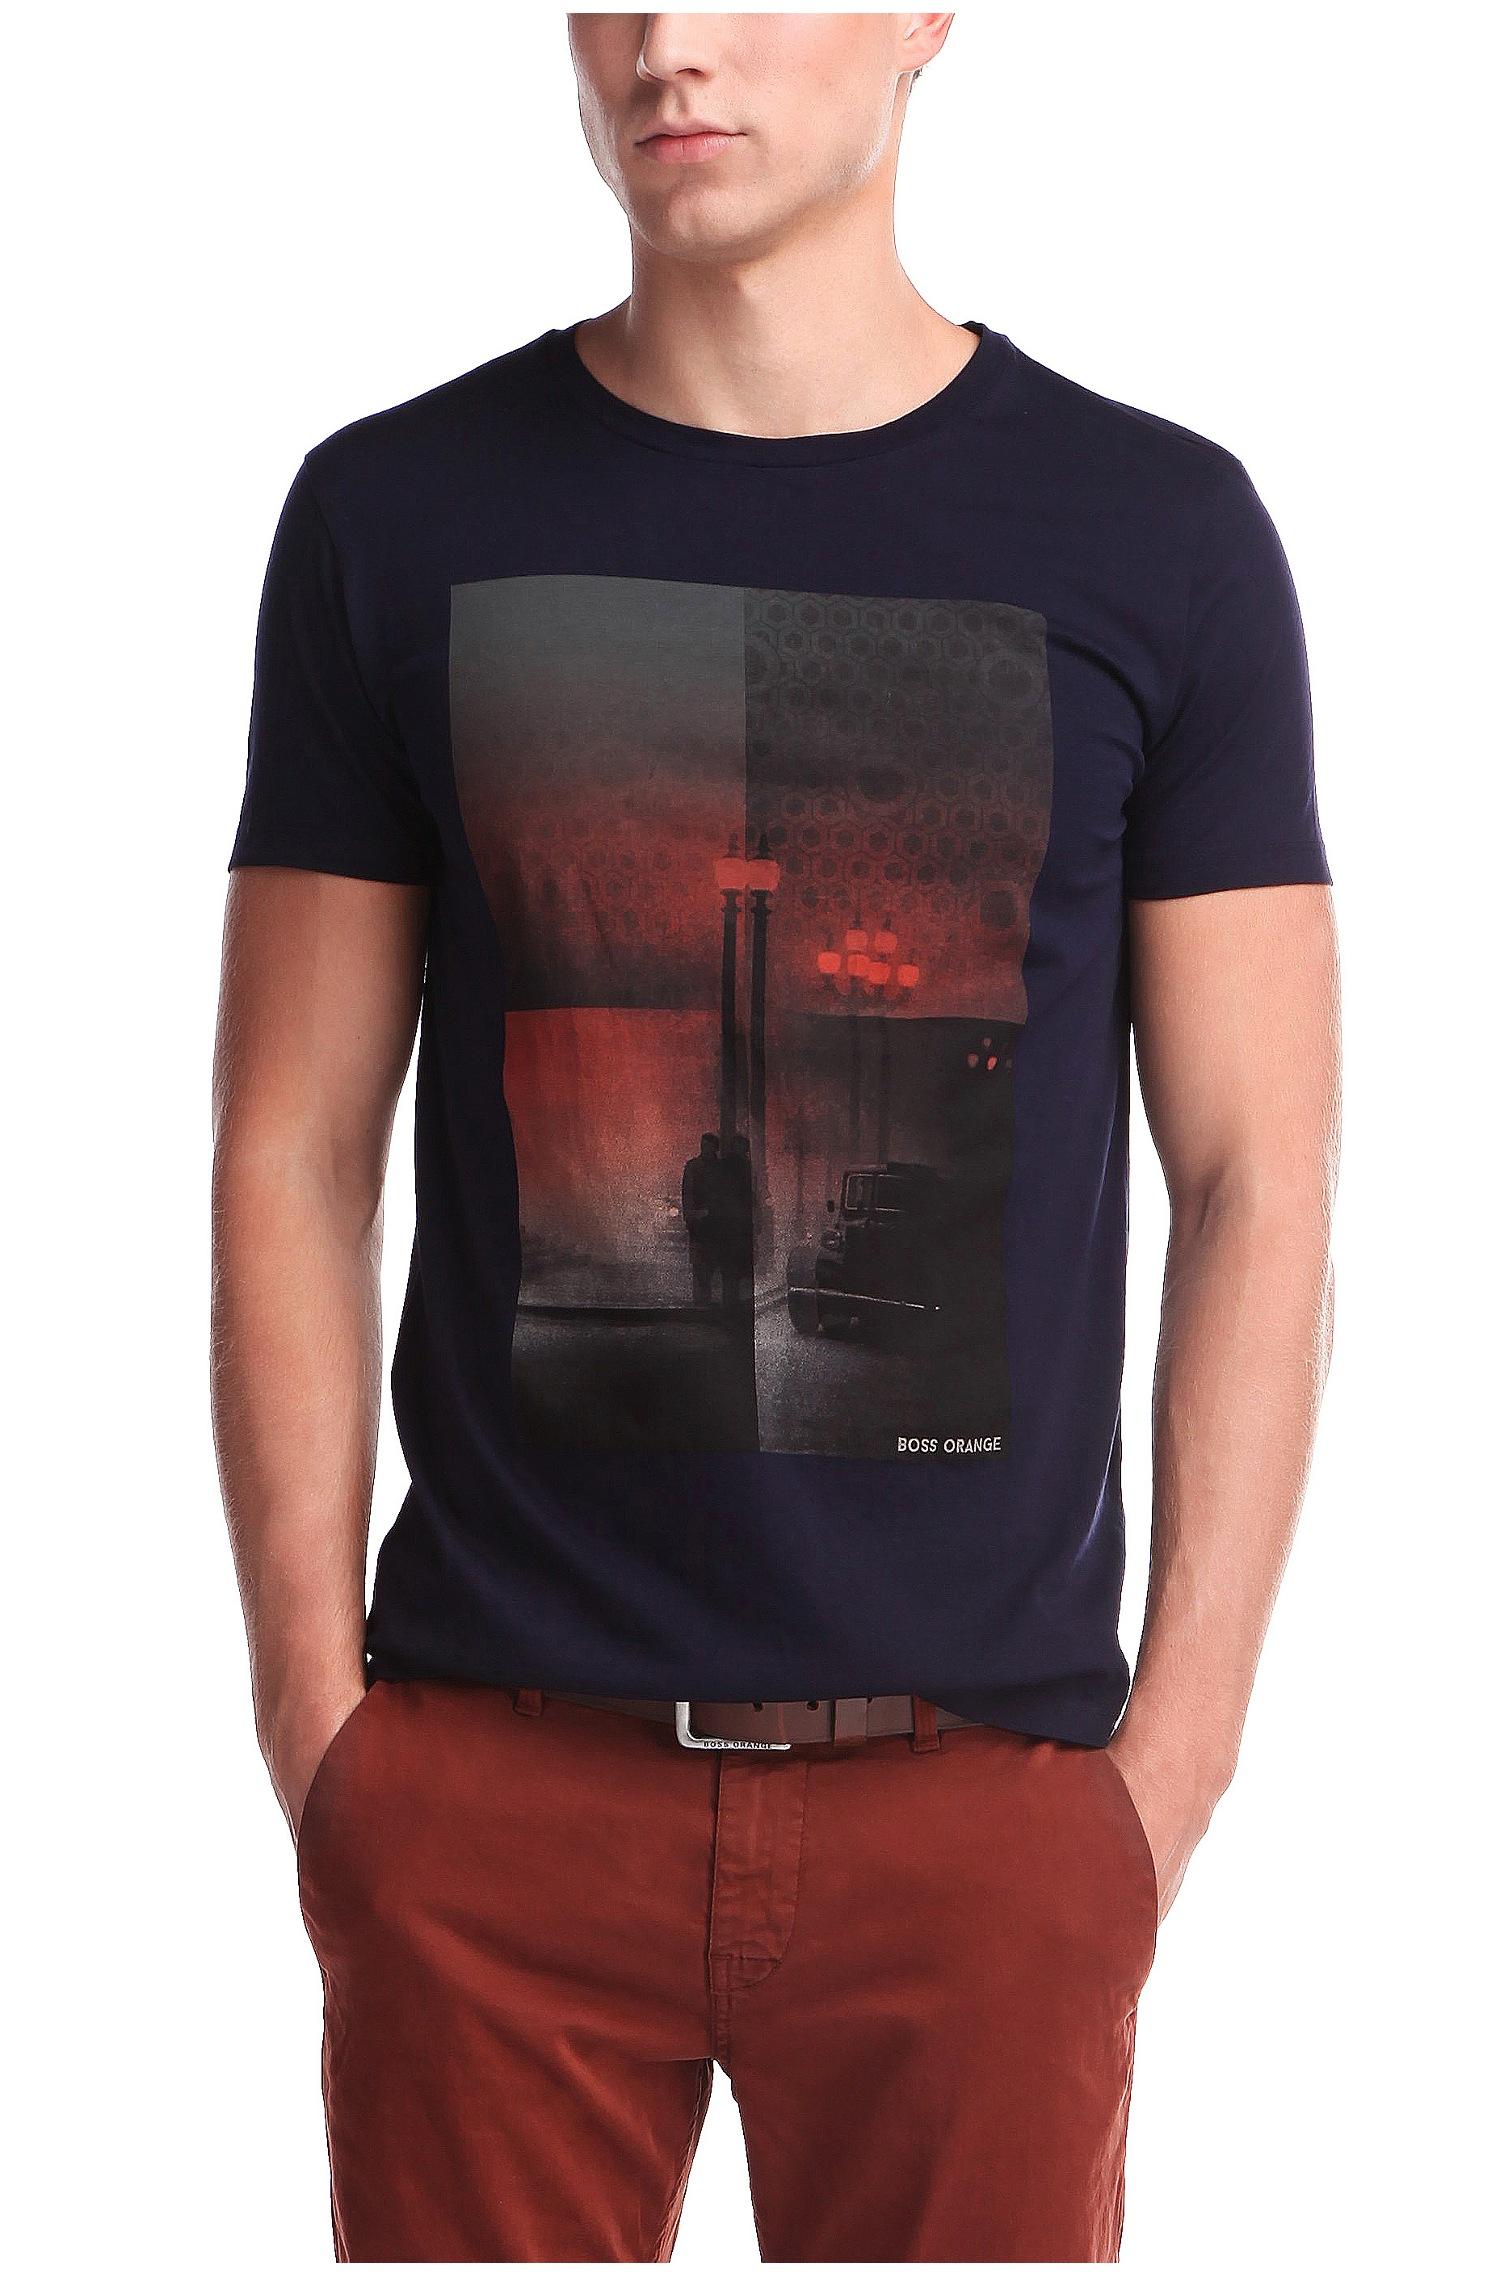 f710c1278 BOSS Orange T-shirt 'thiemon 1' In Cotton in Blue for Men - Lyst